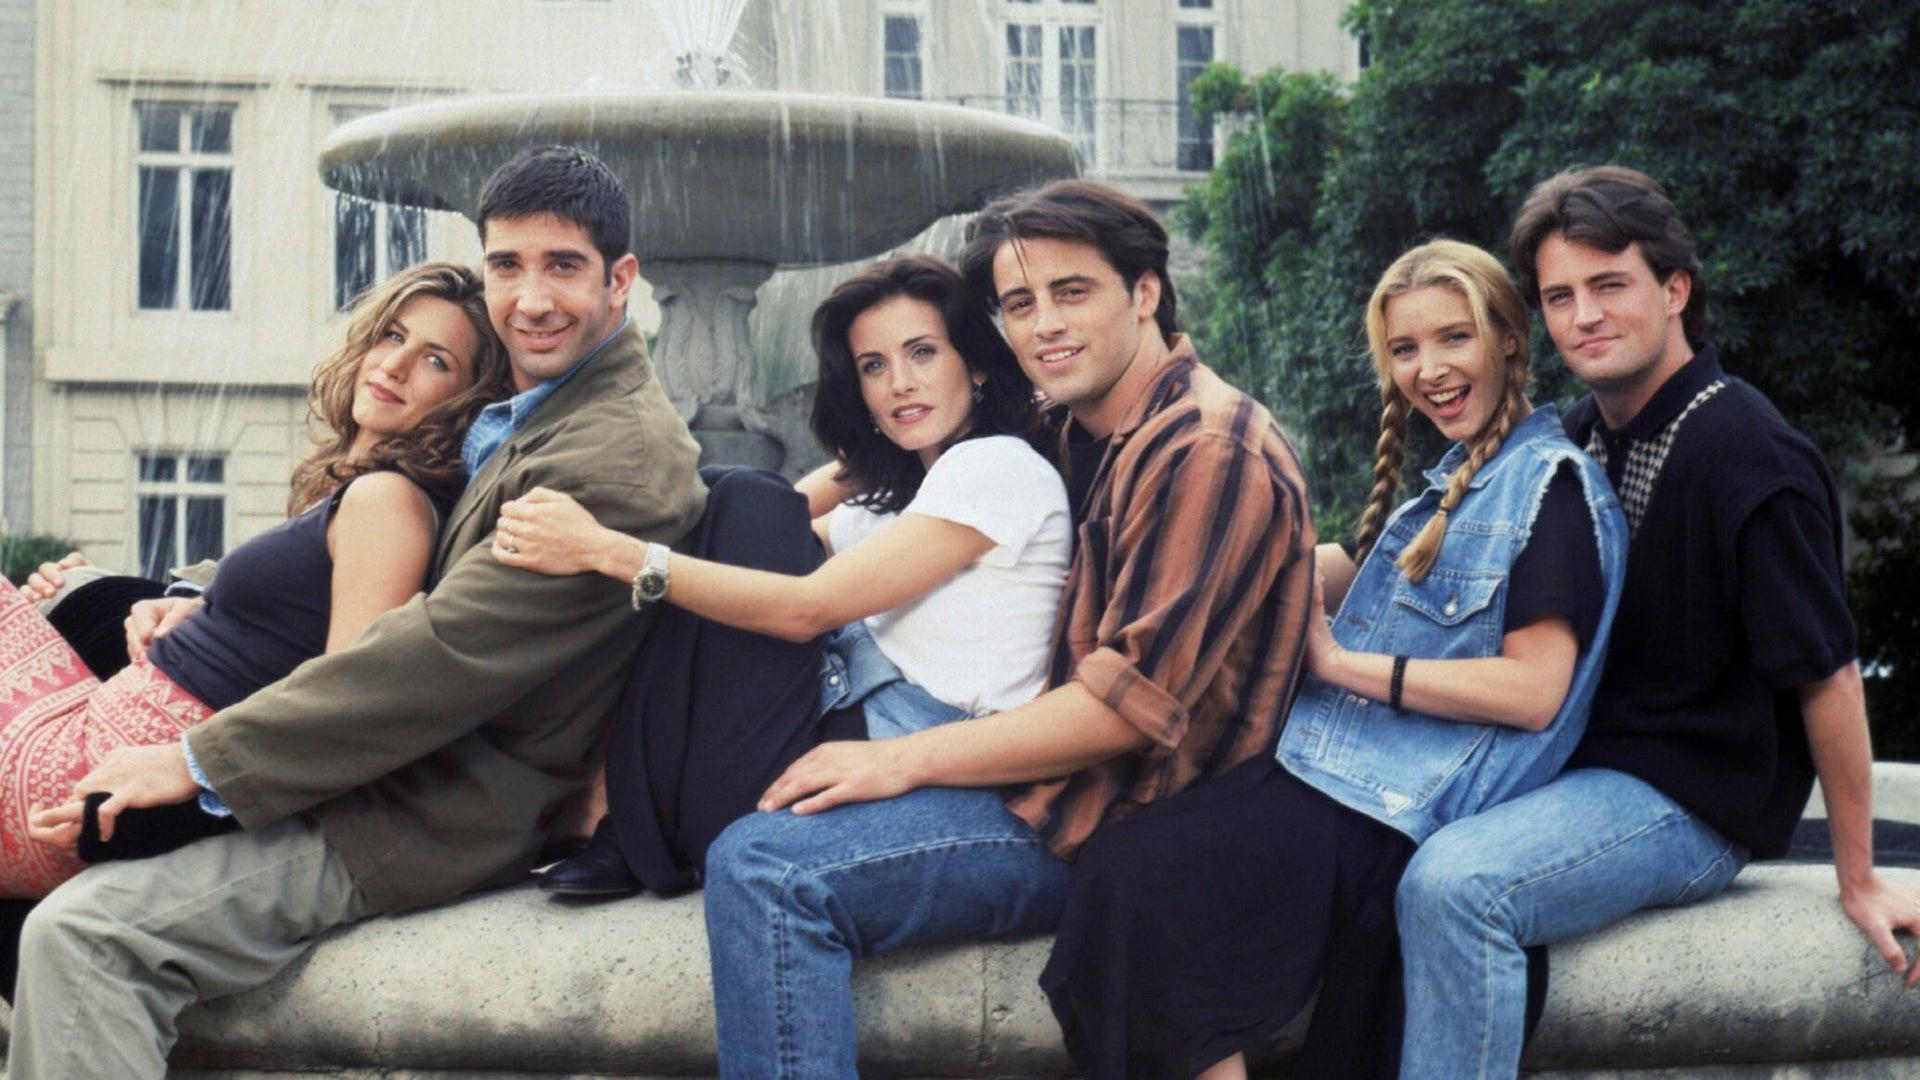 Jennifer Aniston, David Schwimmer, Courteney Cox, Matt LeBlanc, Lisa Kudrow, and Matthew Perry, Friends